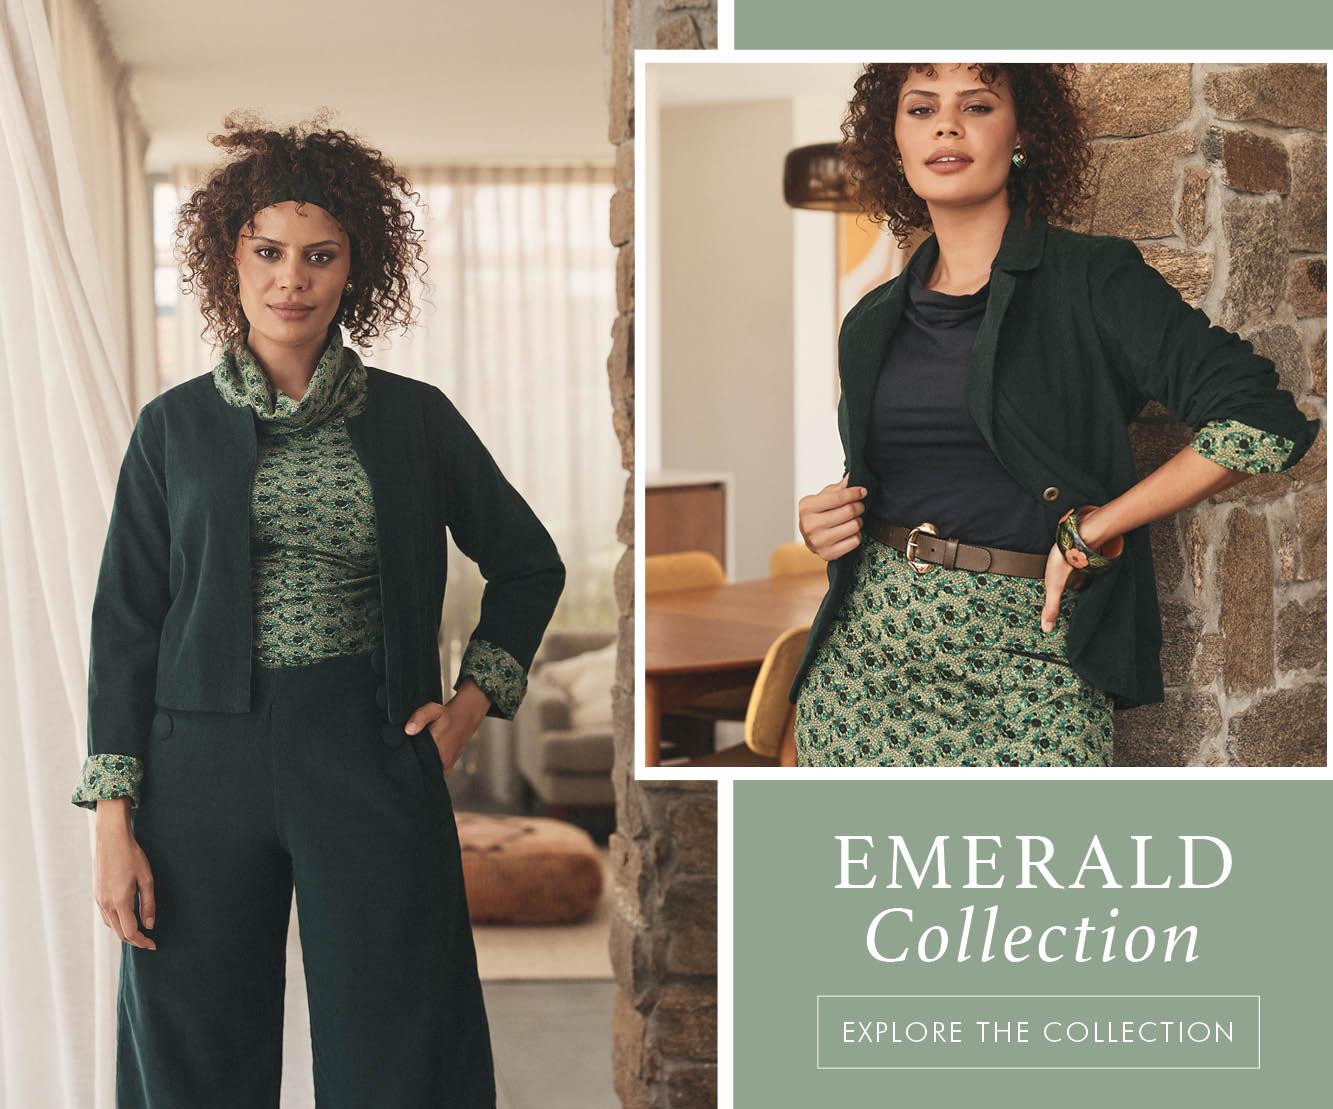 emerald-bottom-home-page-1.jpg